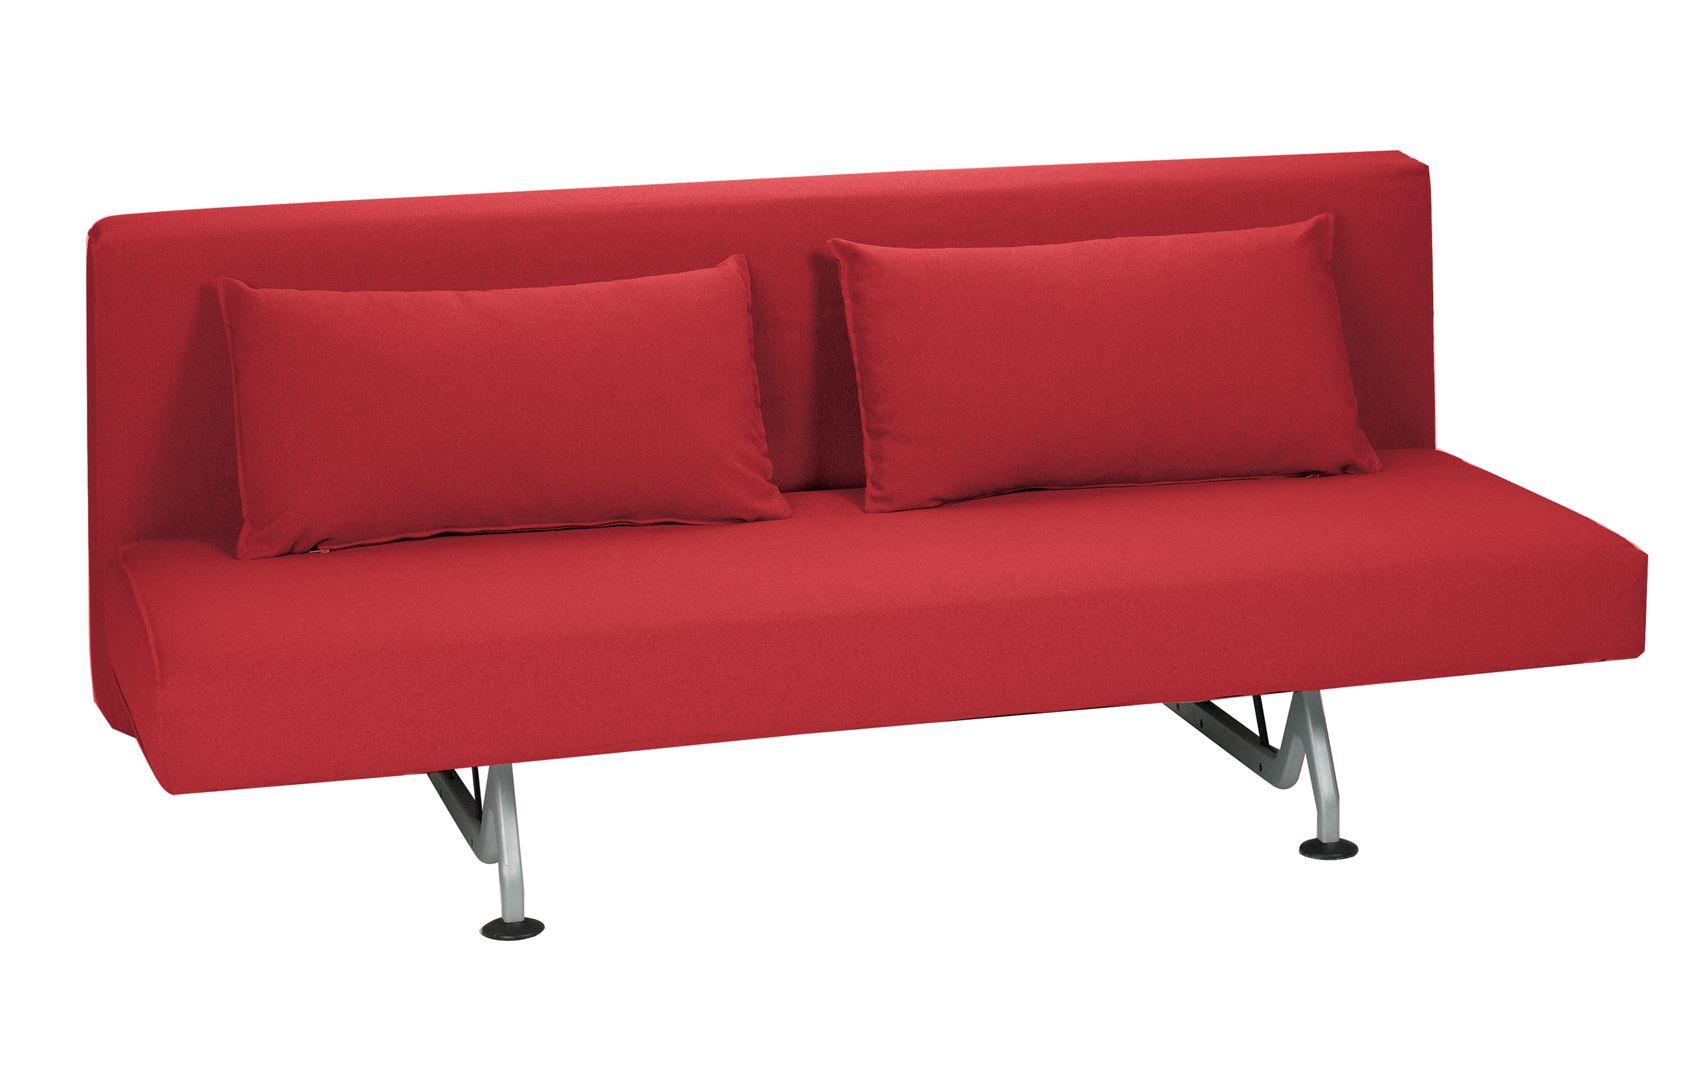 Sofa bed design within reach - Sliding Sleeper Sofa Sleepers At Design Within Reach